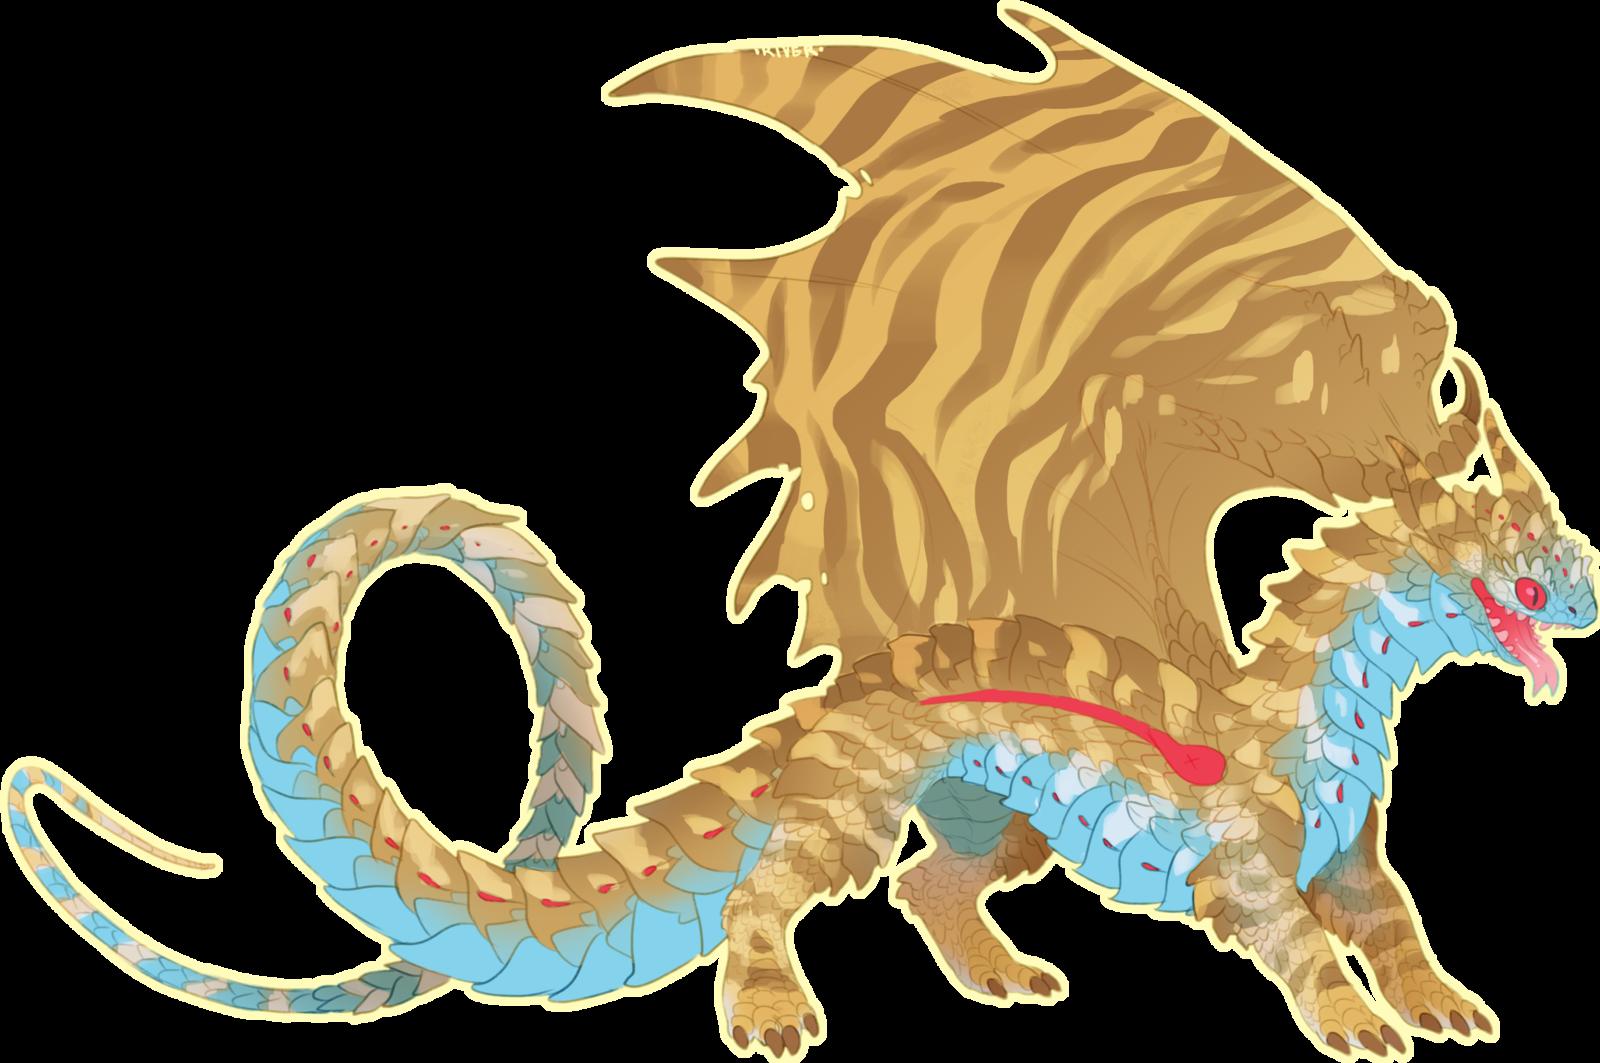 image freeuse download Bush vipers dragon river. Drawing snake mythical